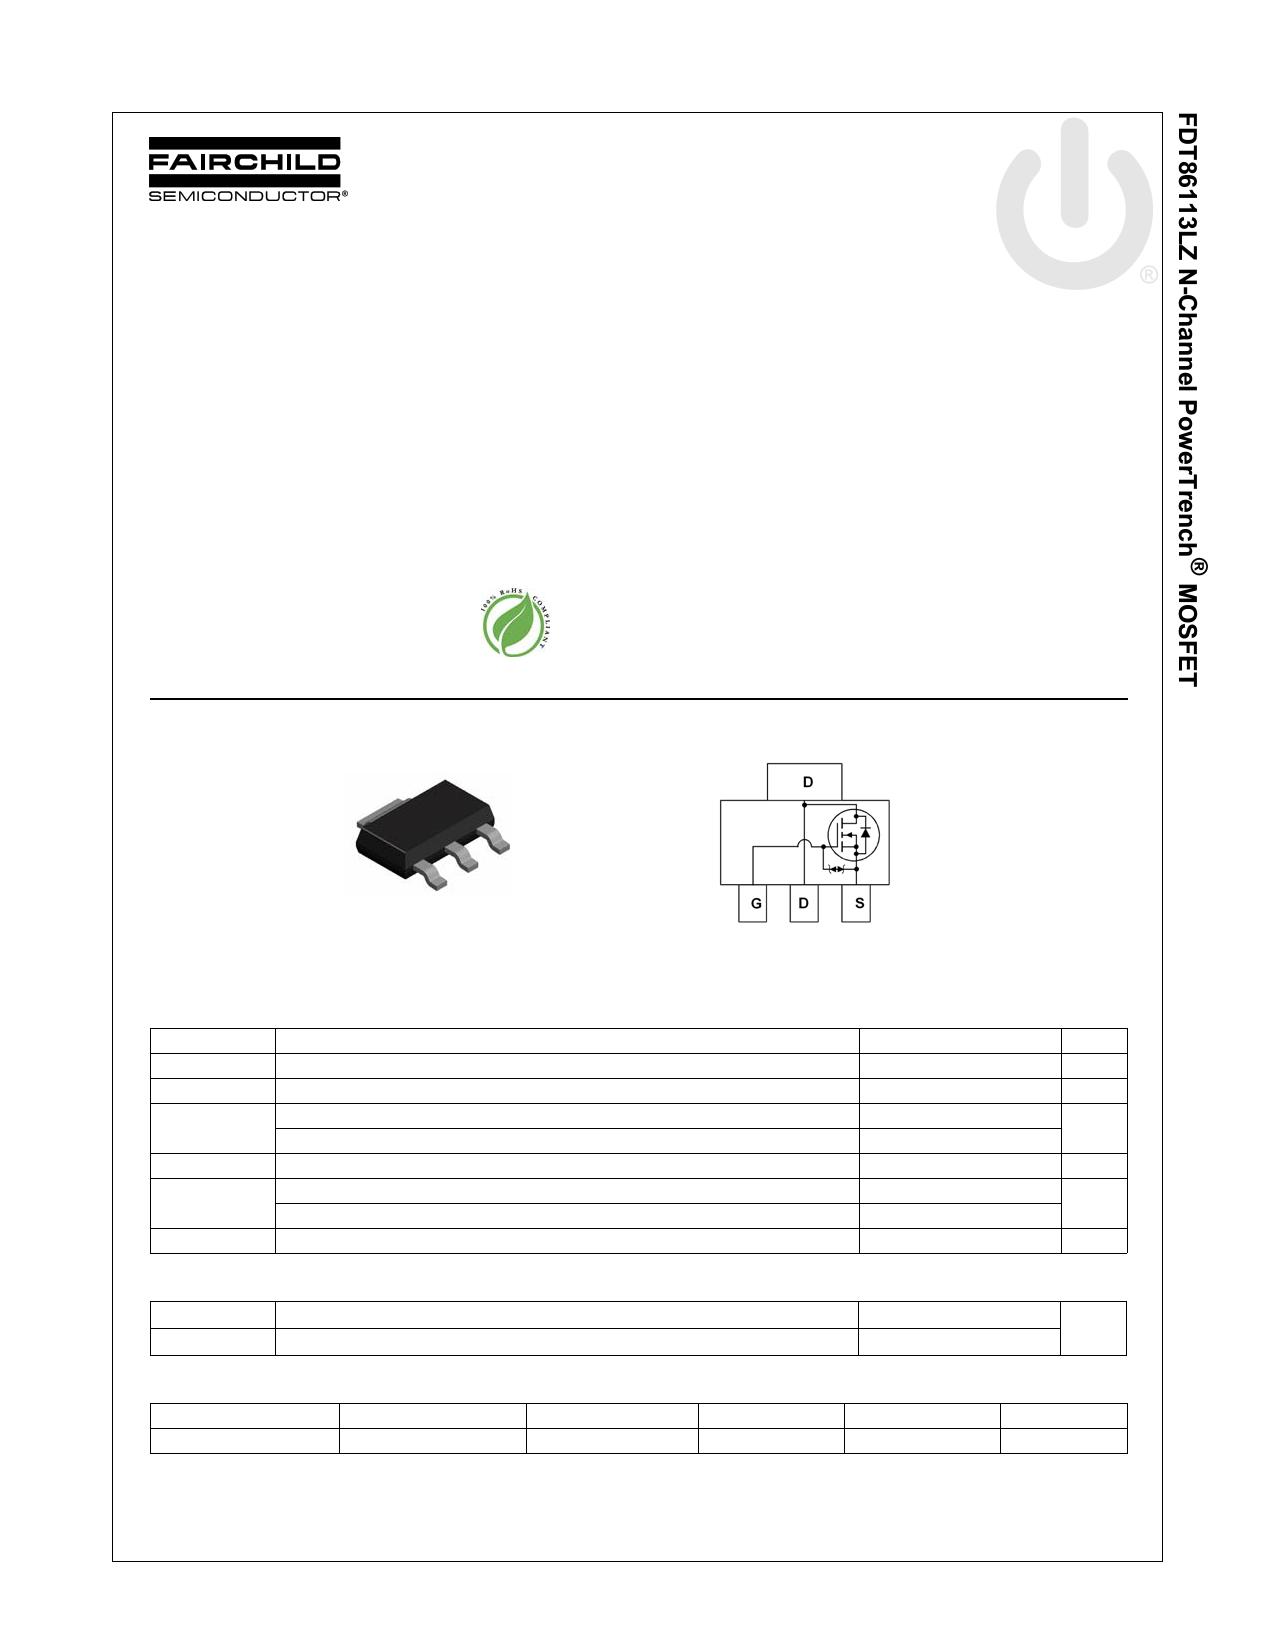 FDT86113LZ 데이터시트 및 FDT86113LZ PDF